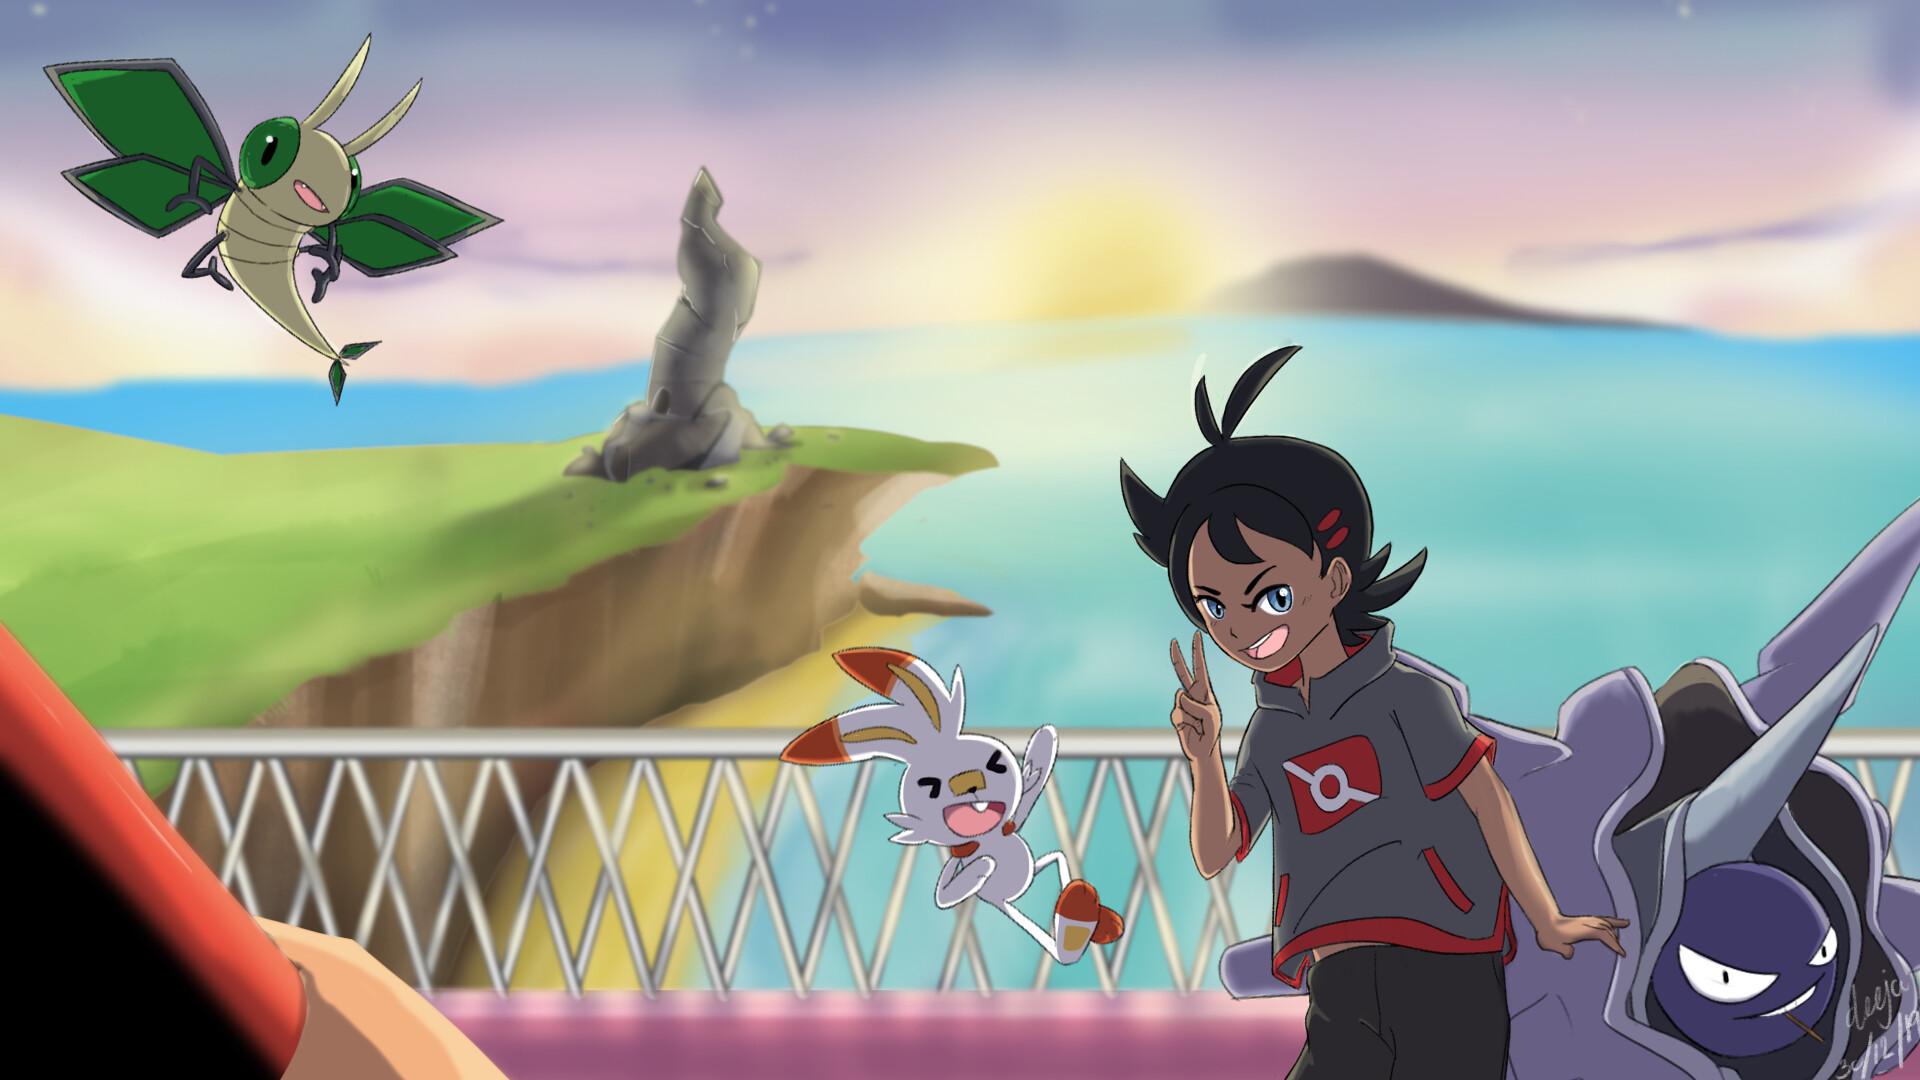 Supakorn Sahunon Pokemon Go Anime Free download high quality anime. supakorn sahunon